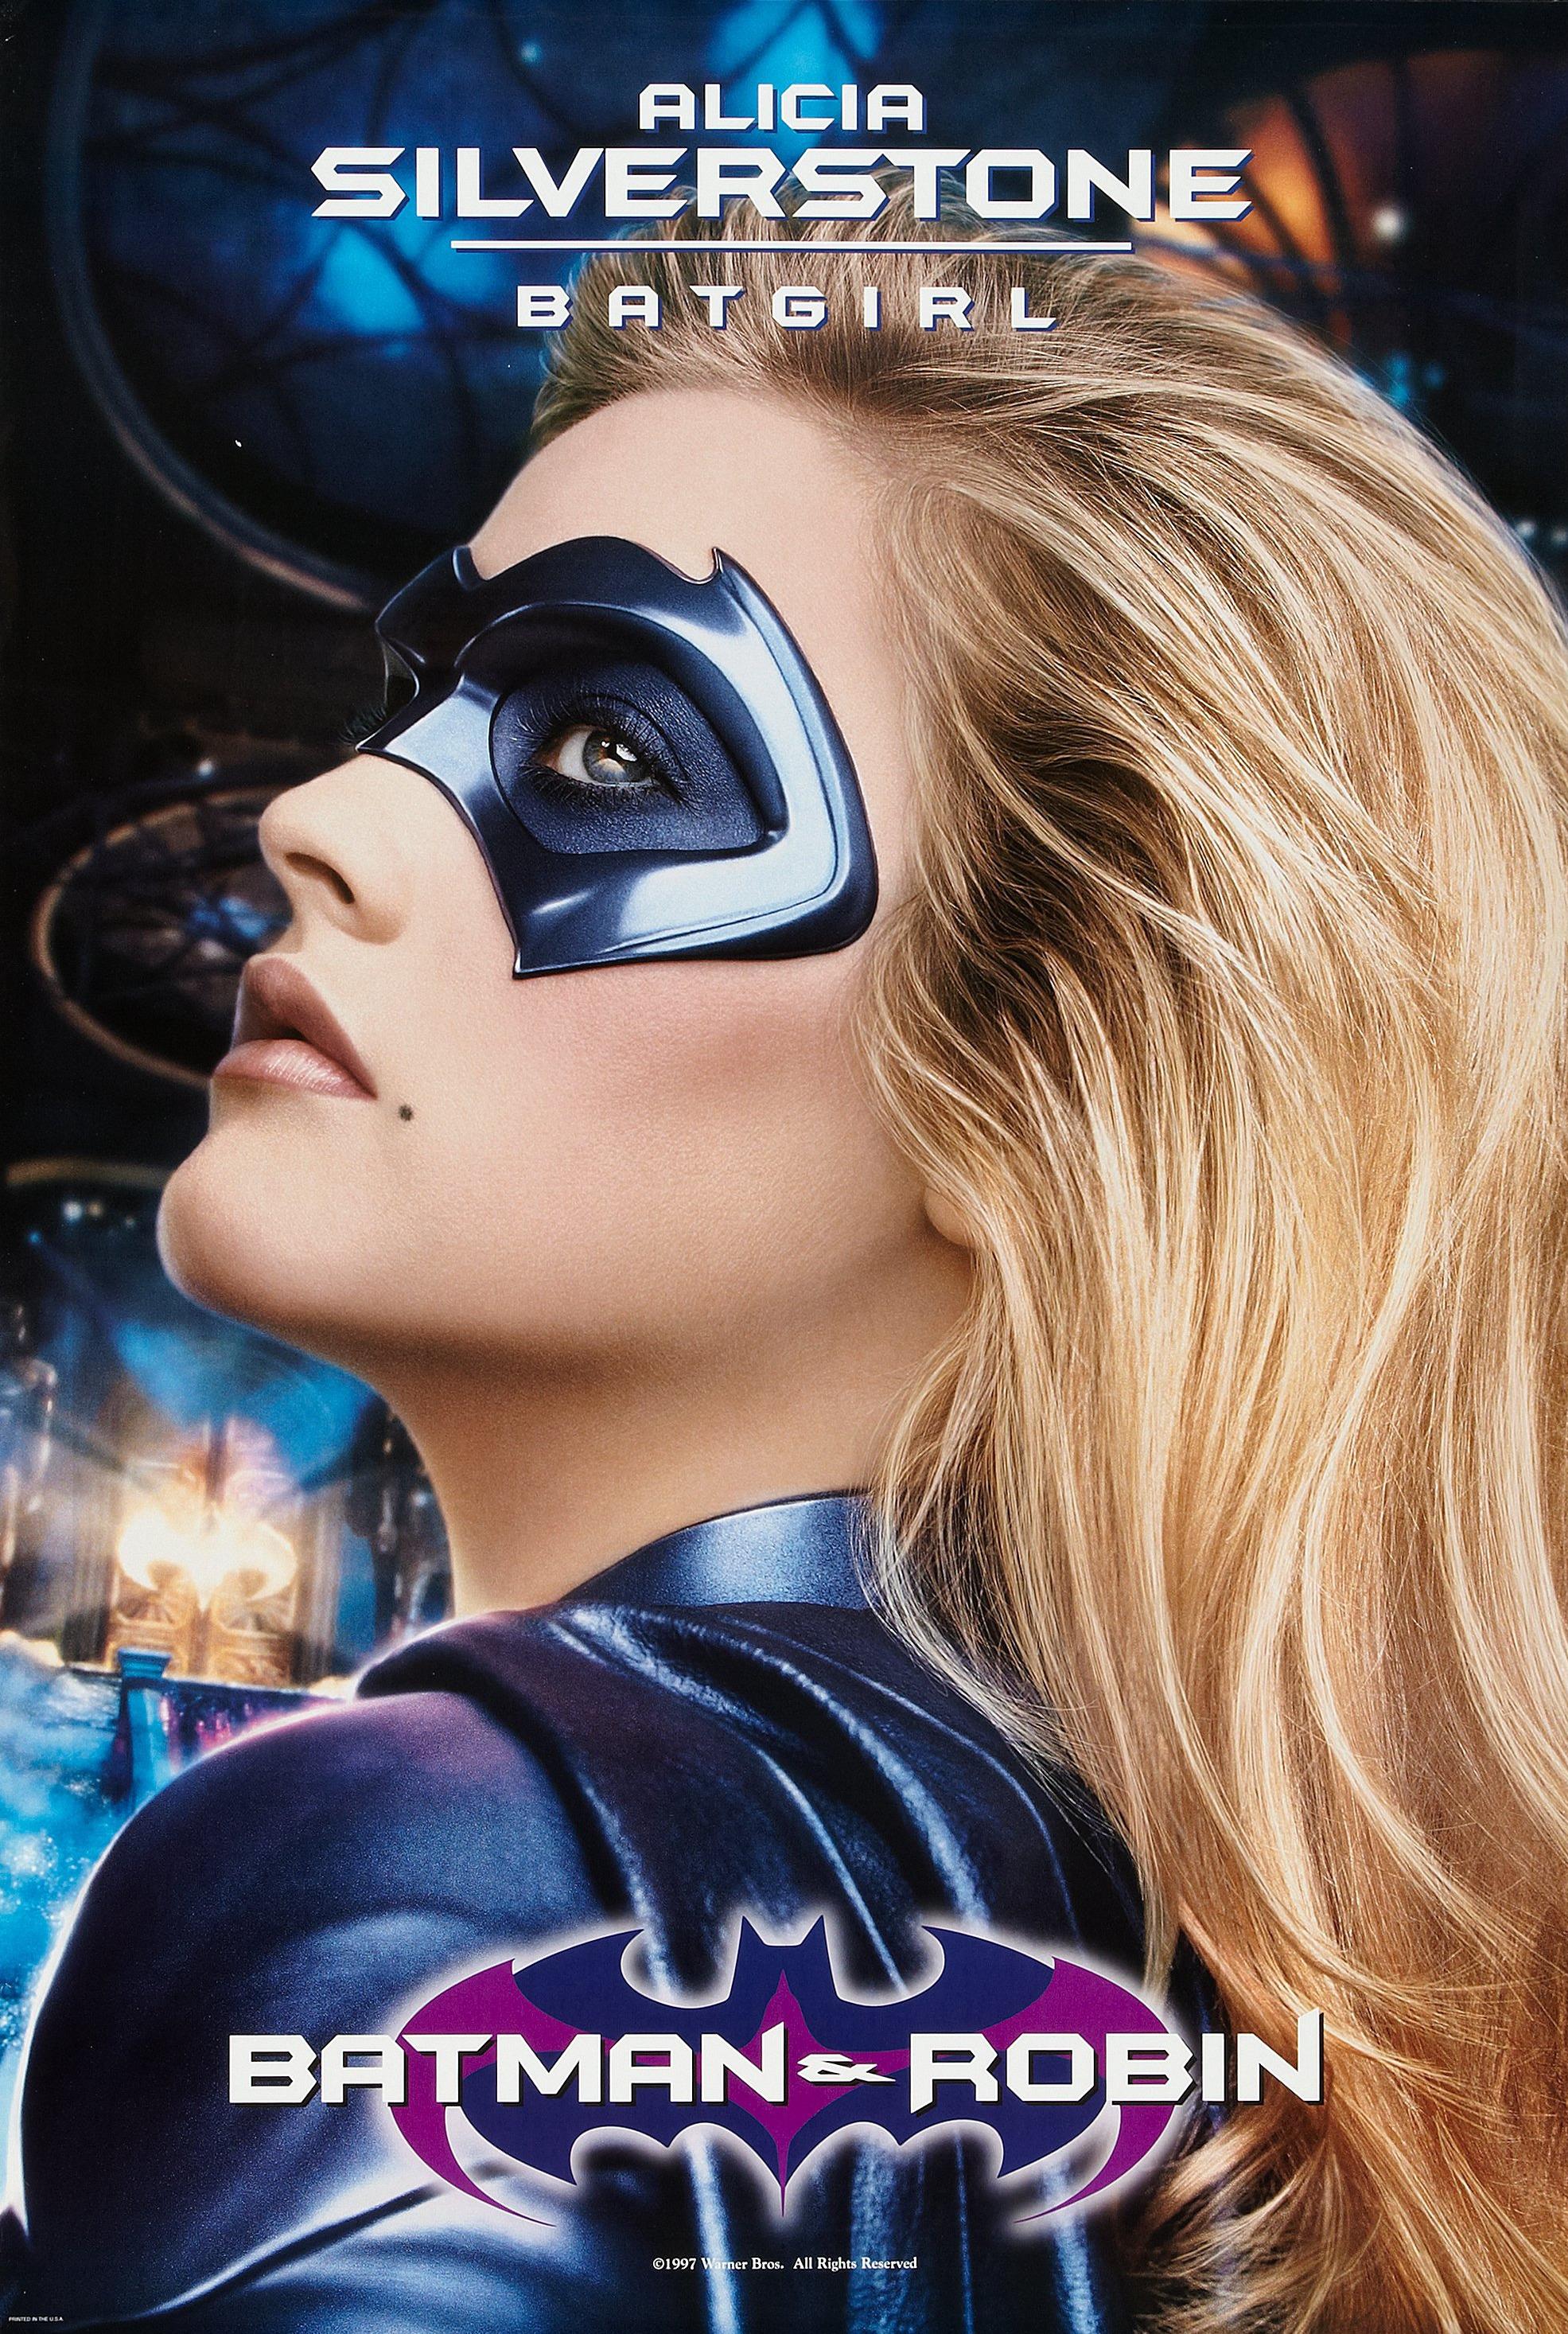 File:Batgirl (Movie Poster).jpg